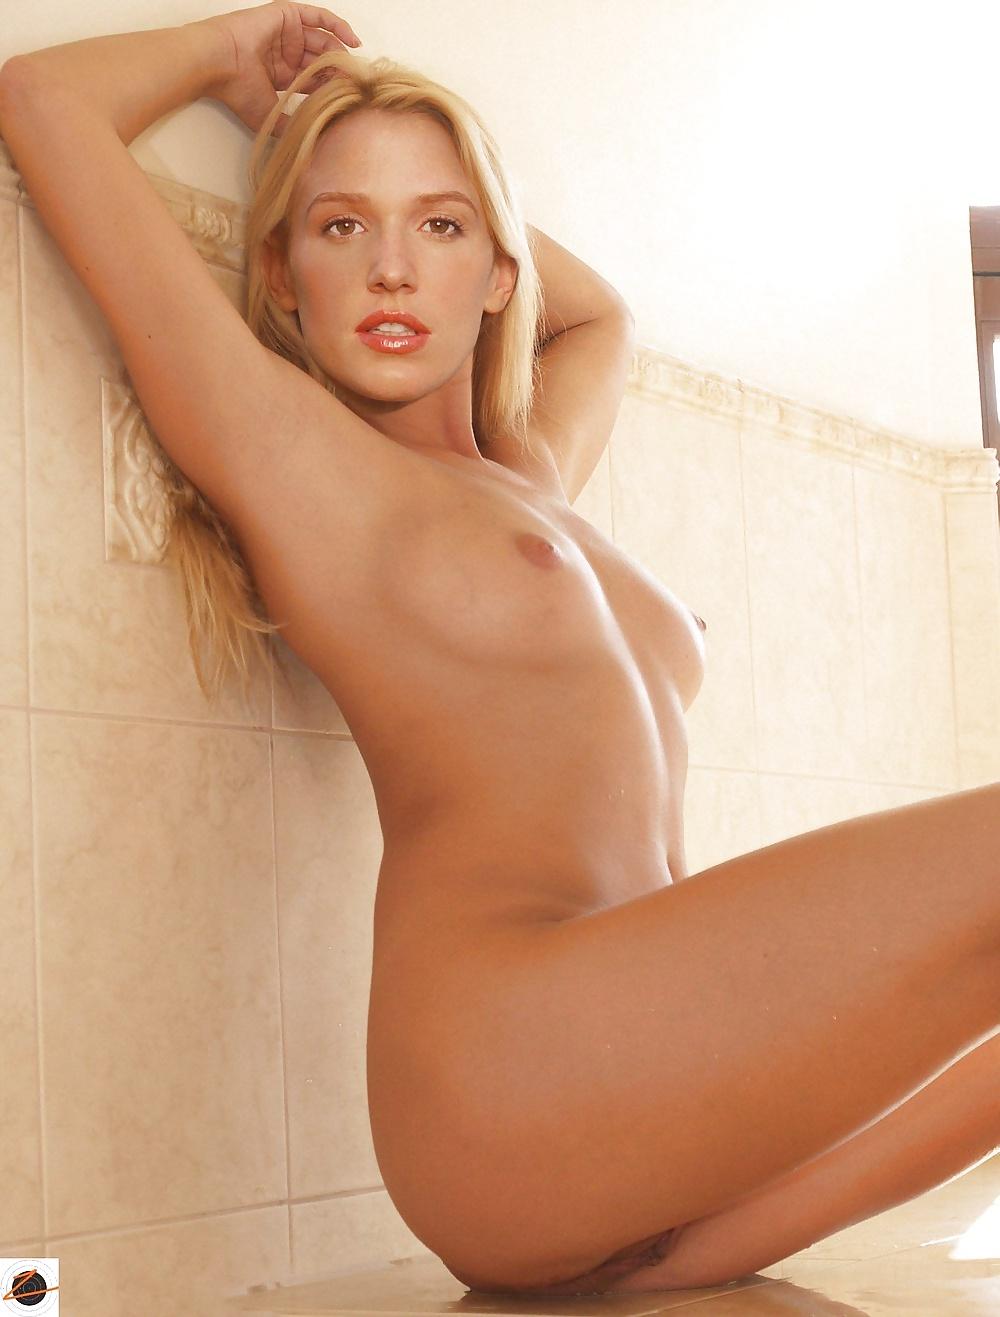 poppy-montgomery-porn-fakes-thailand-group-nude